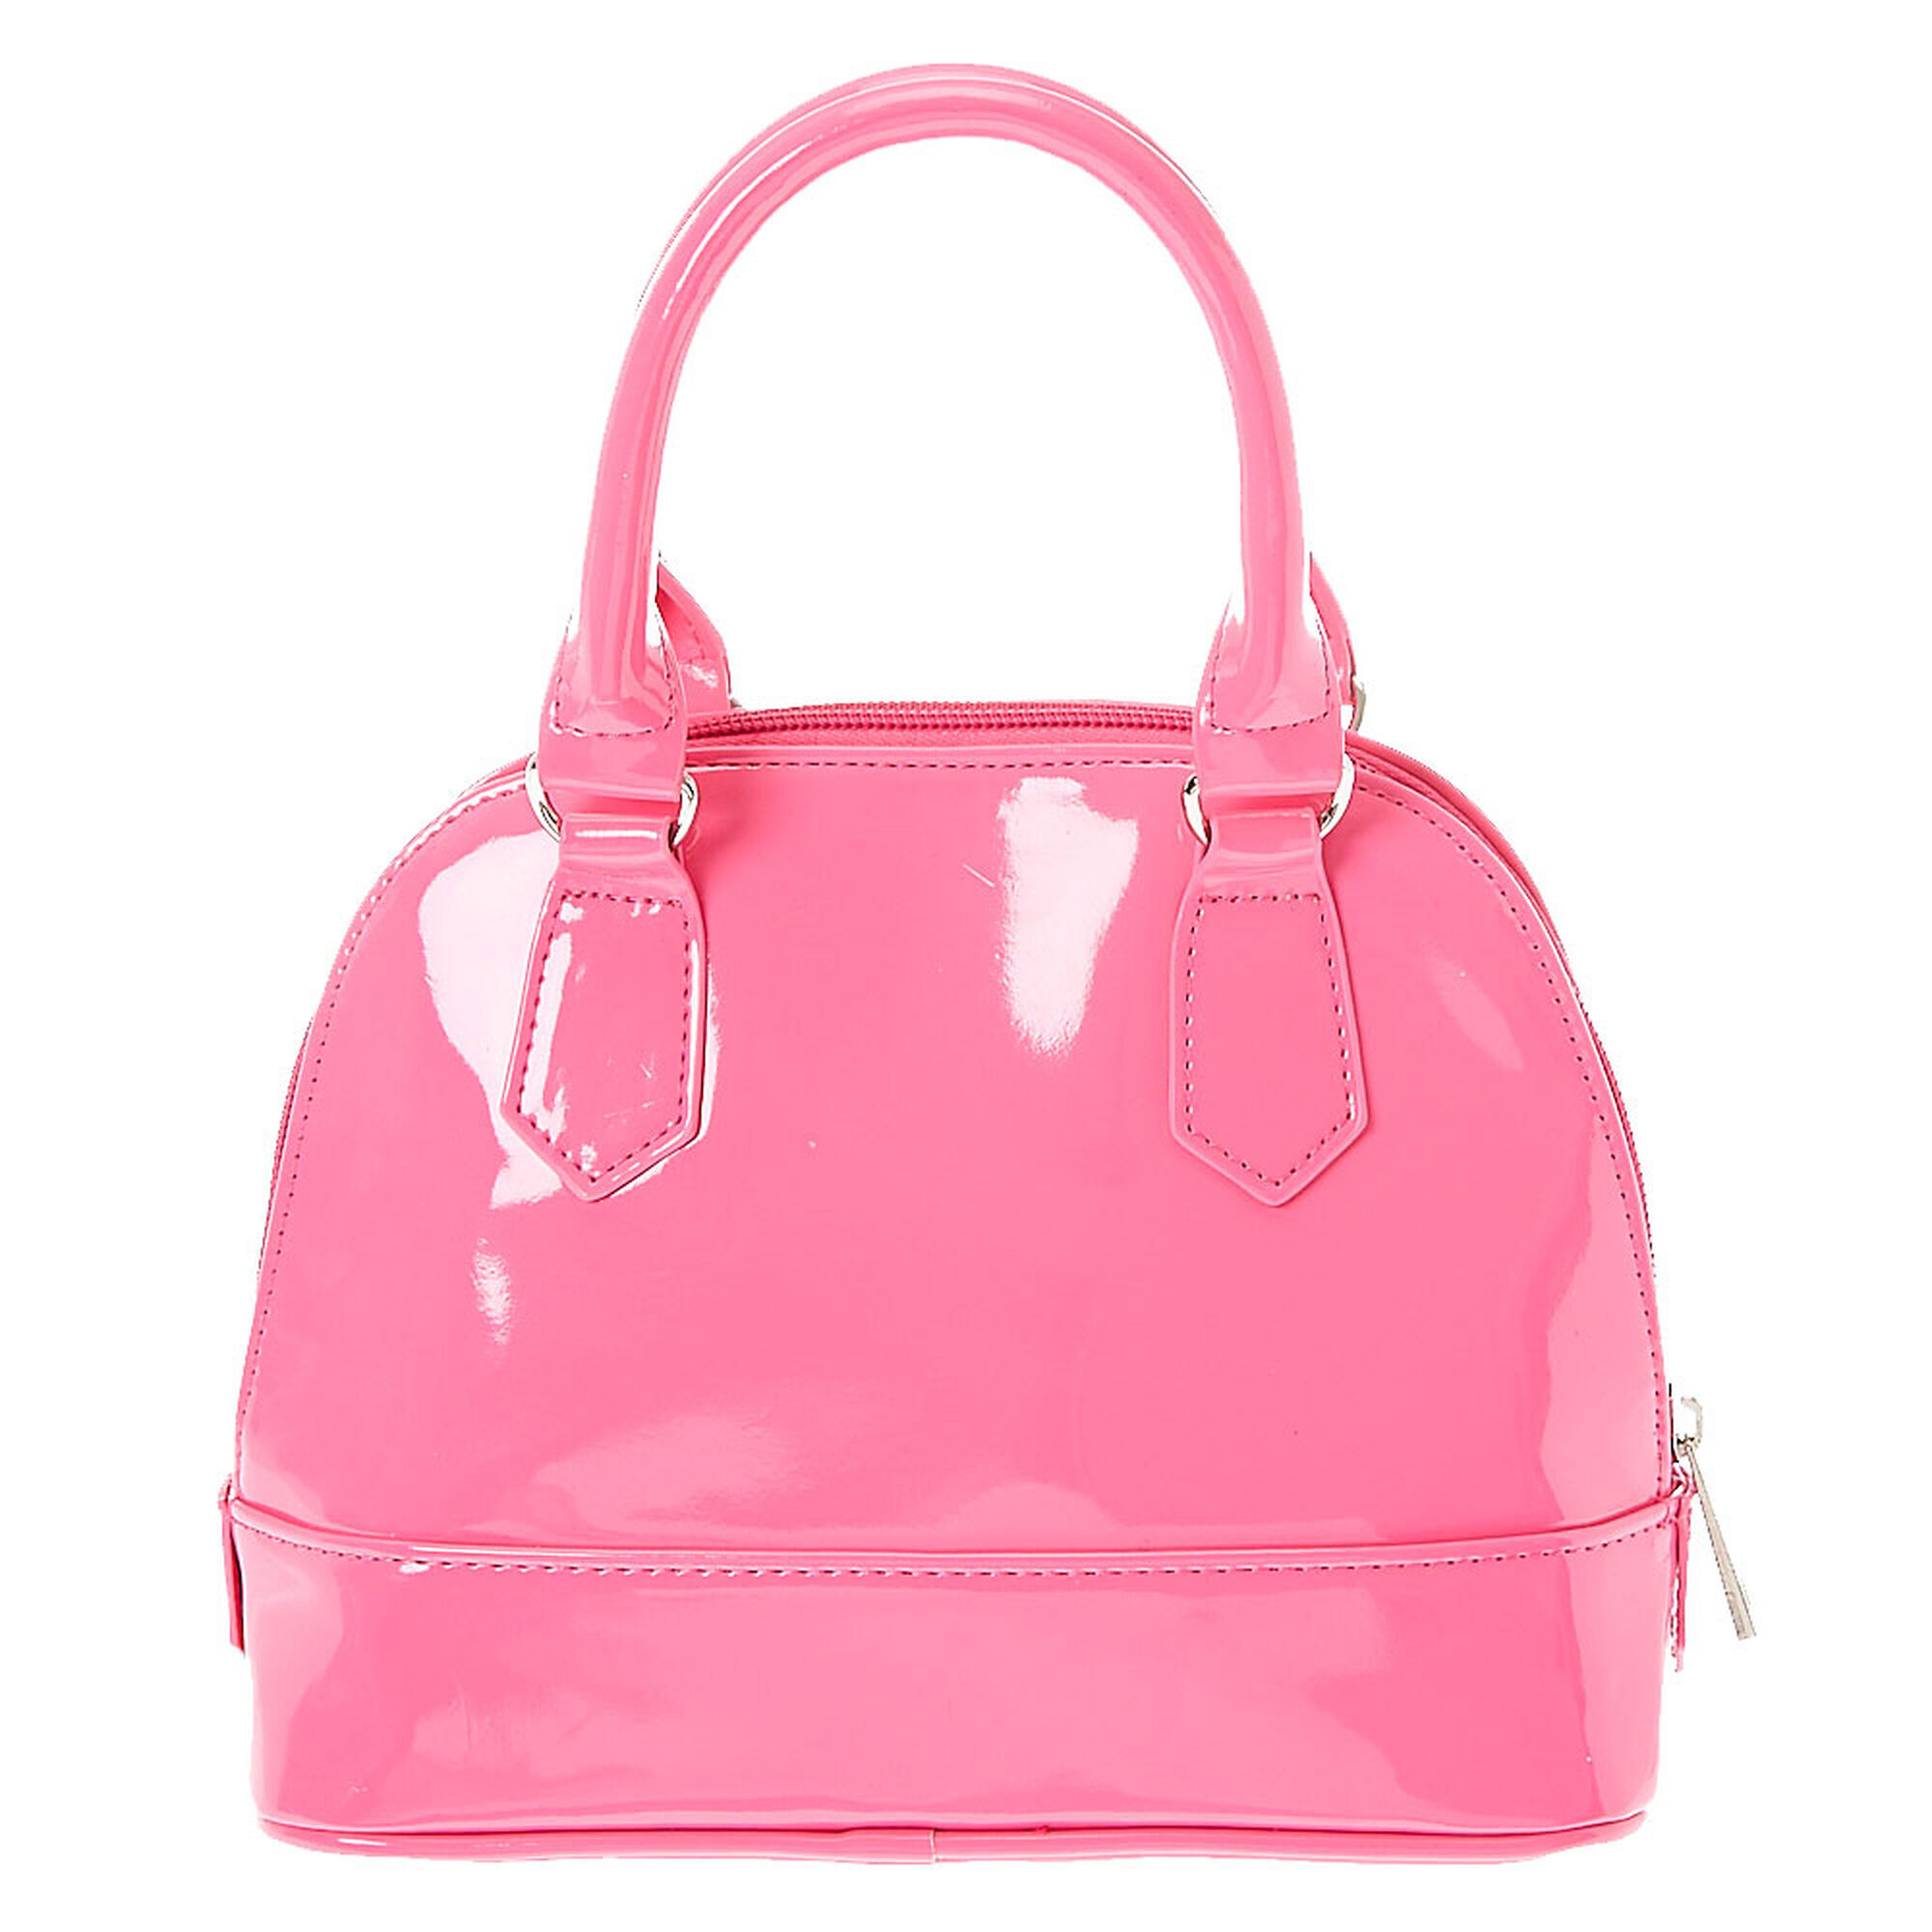 Find great deals on eBay for kids satchel bag. Shop with confidence.